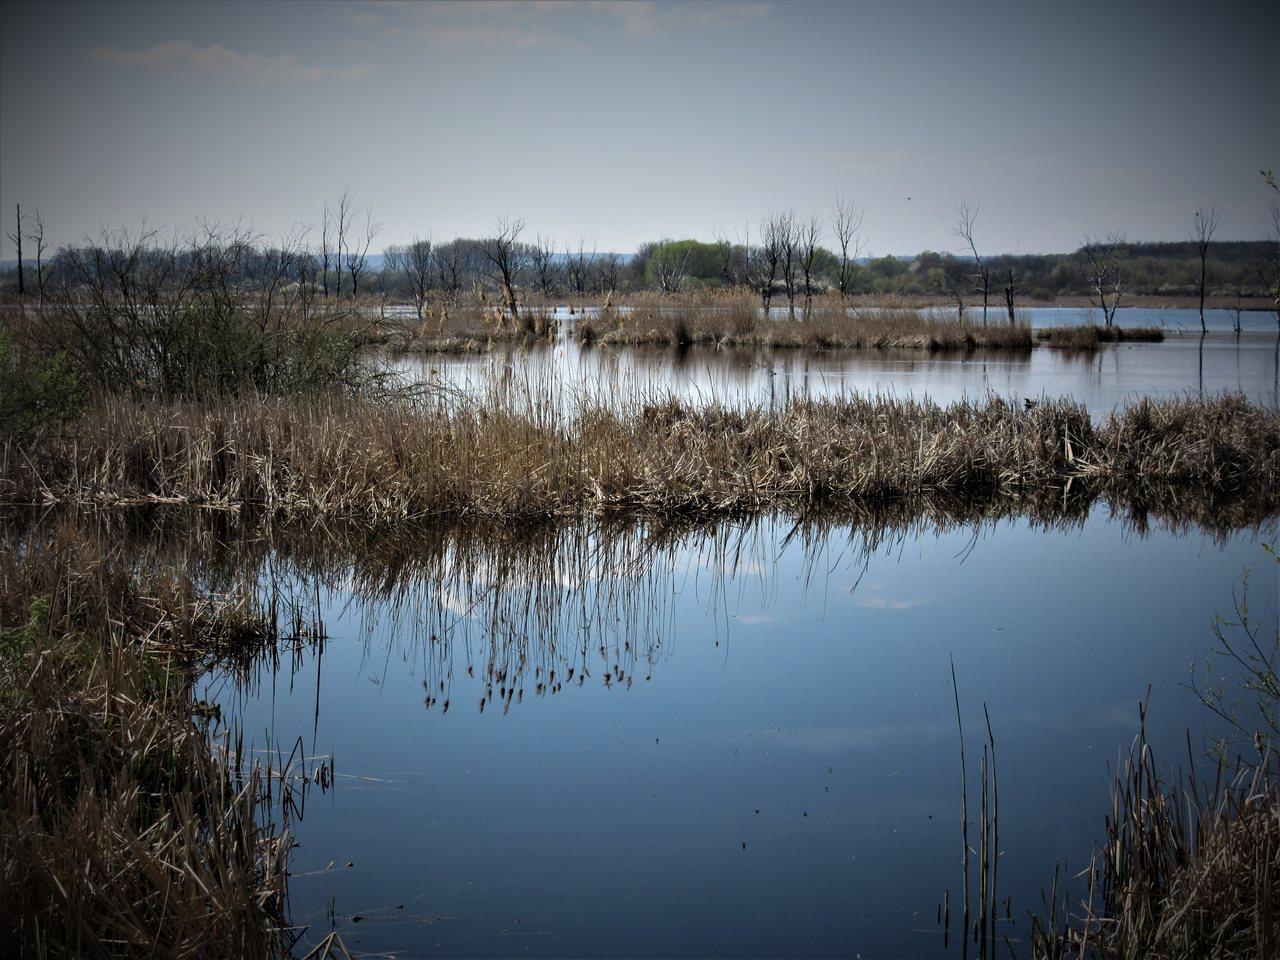 Kis-Balaton reed fields and dead trees